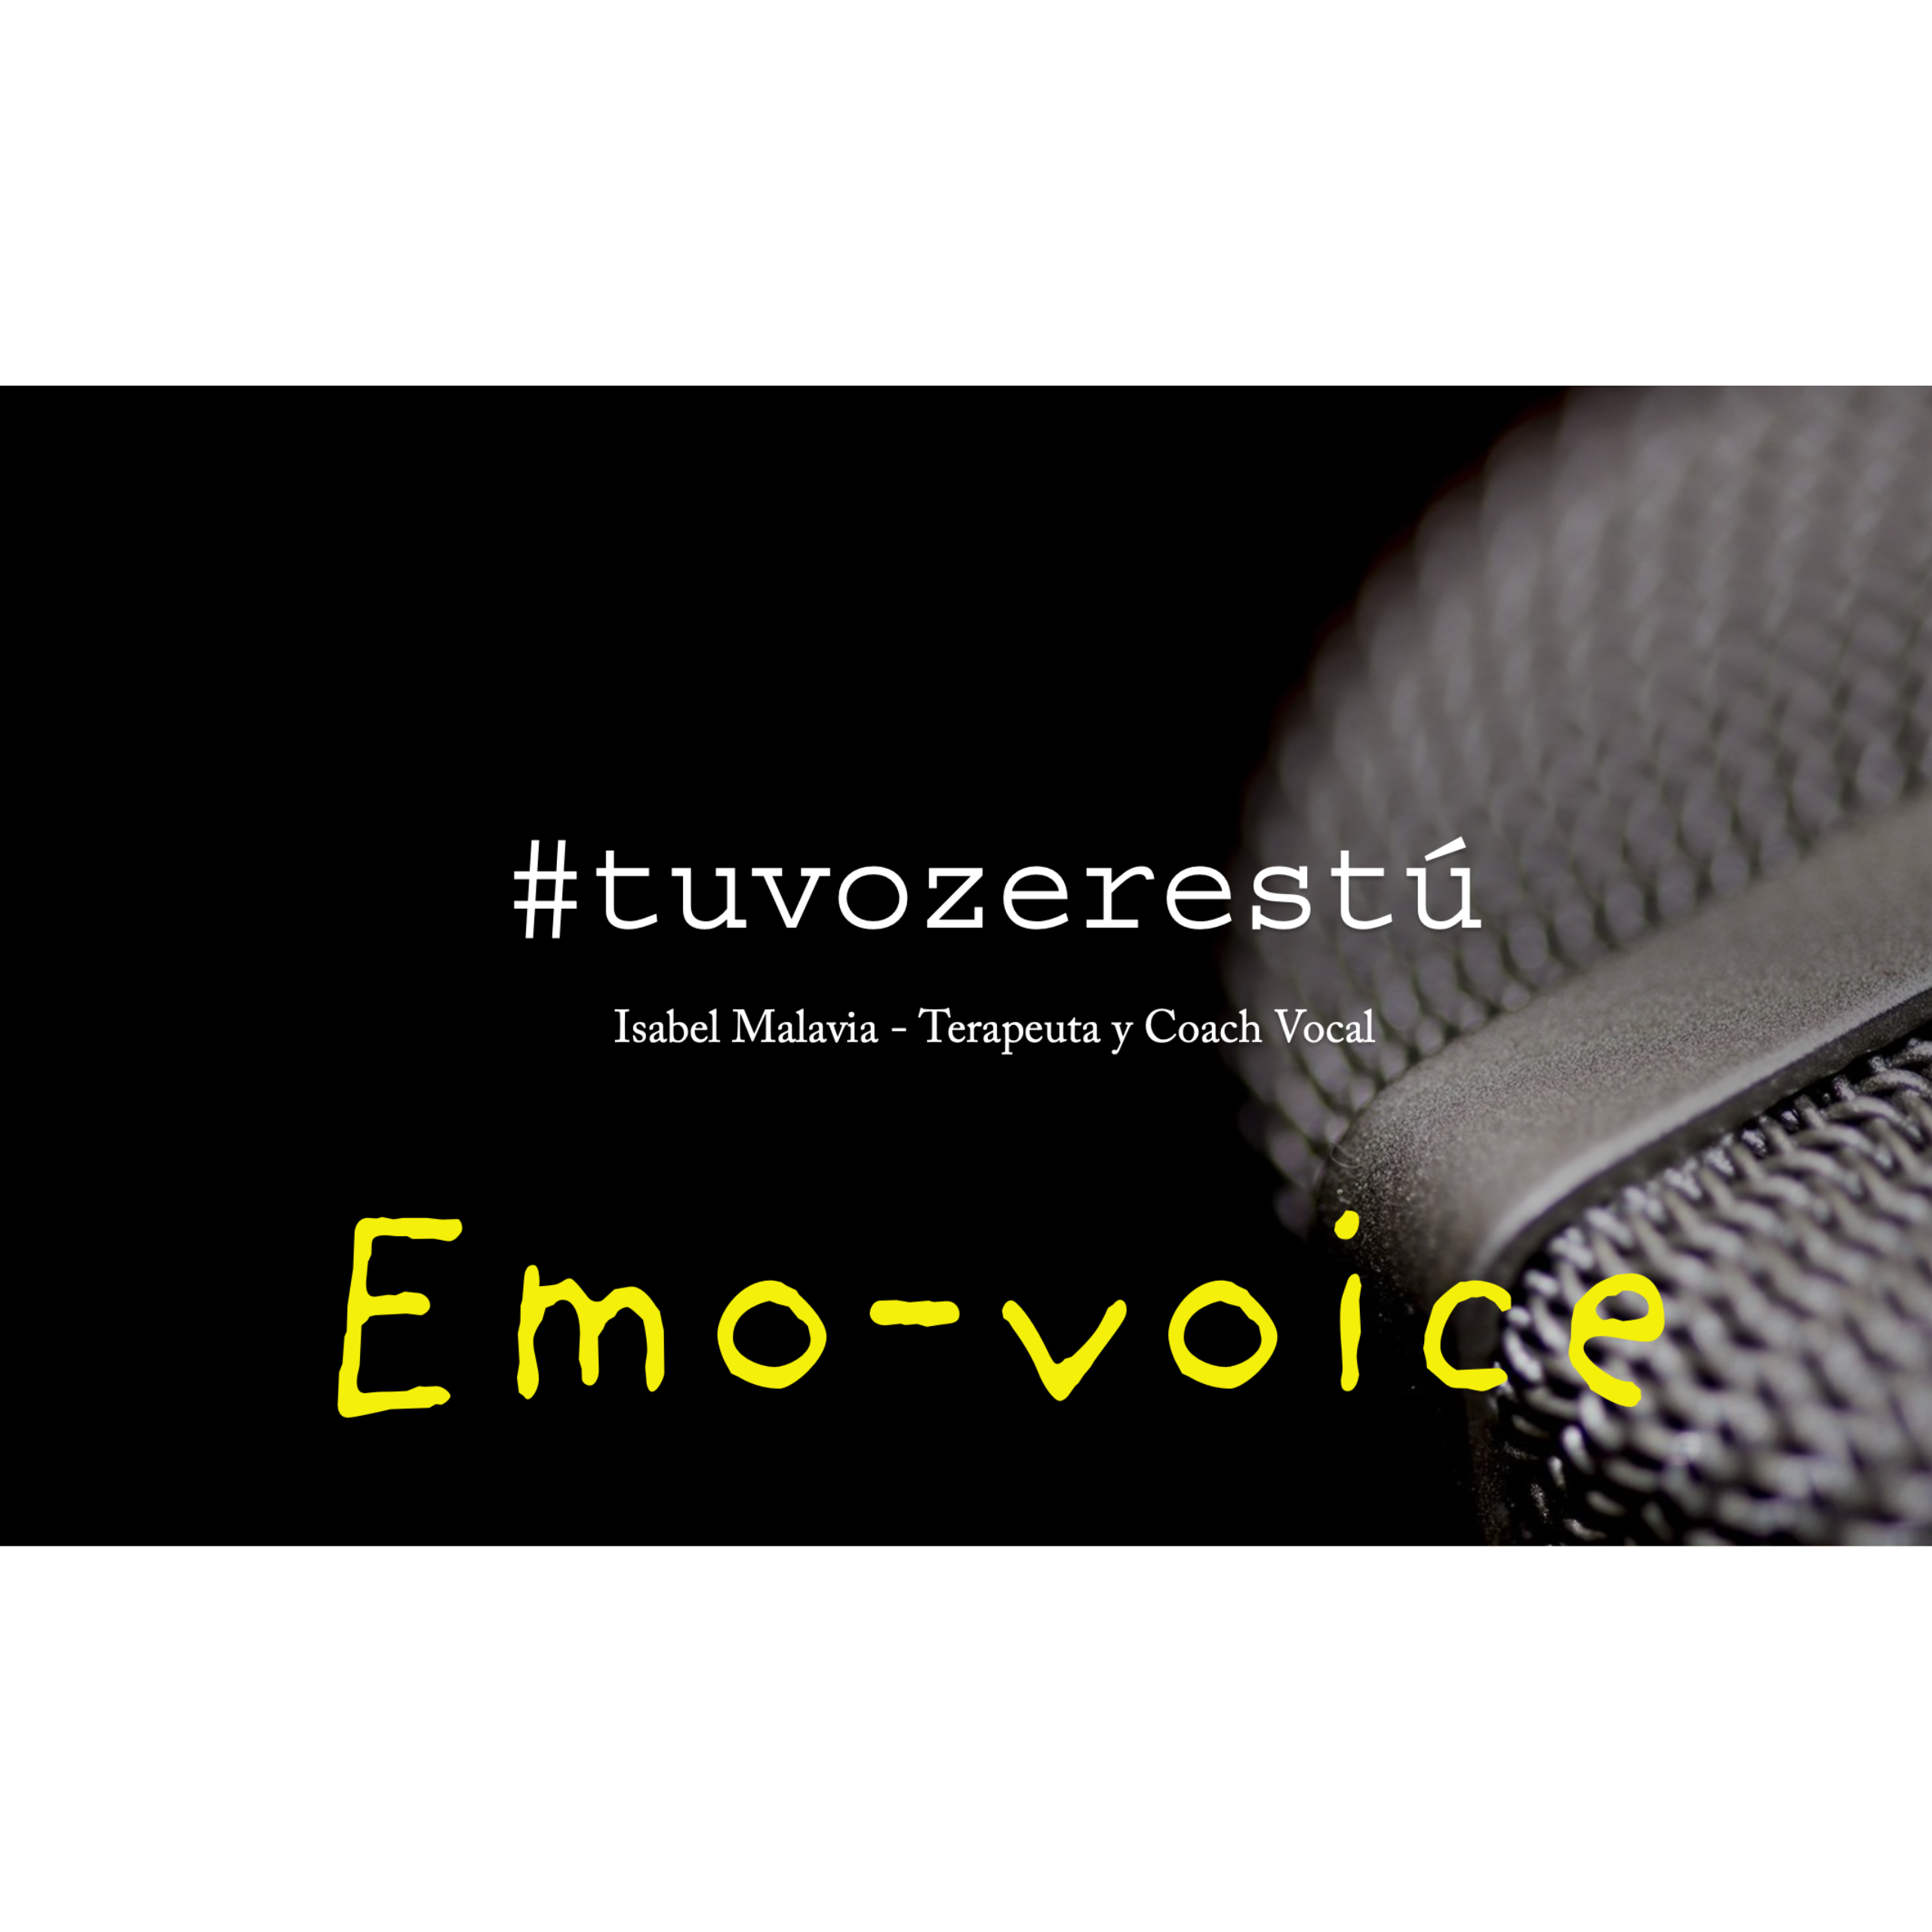 EMO - VOICE